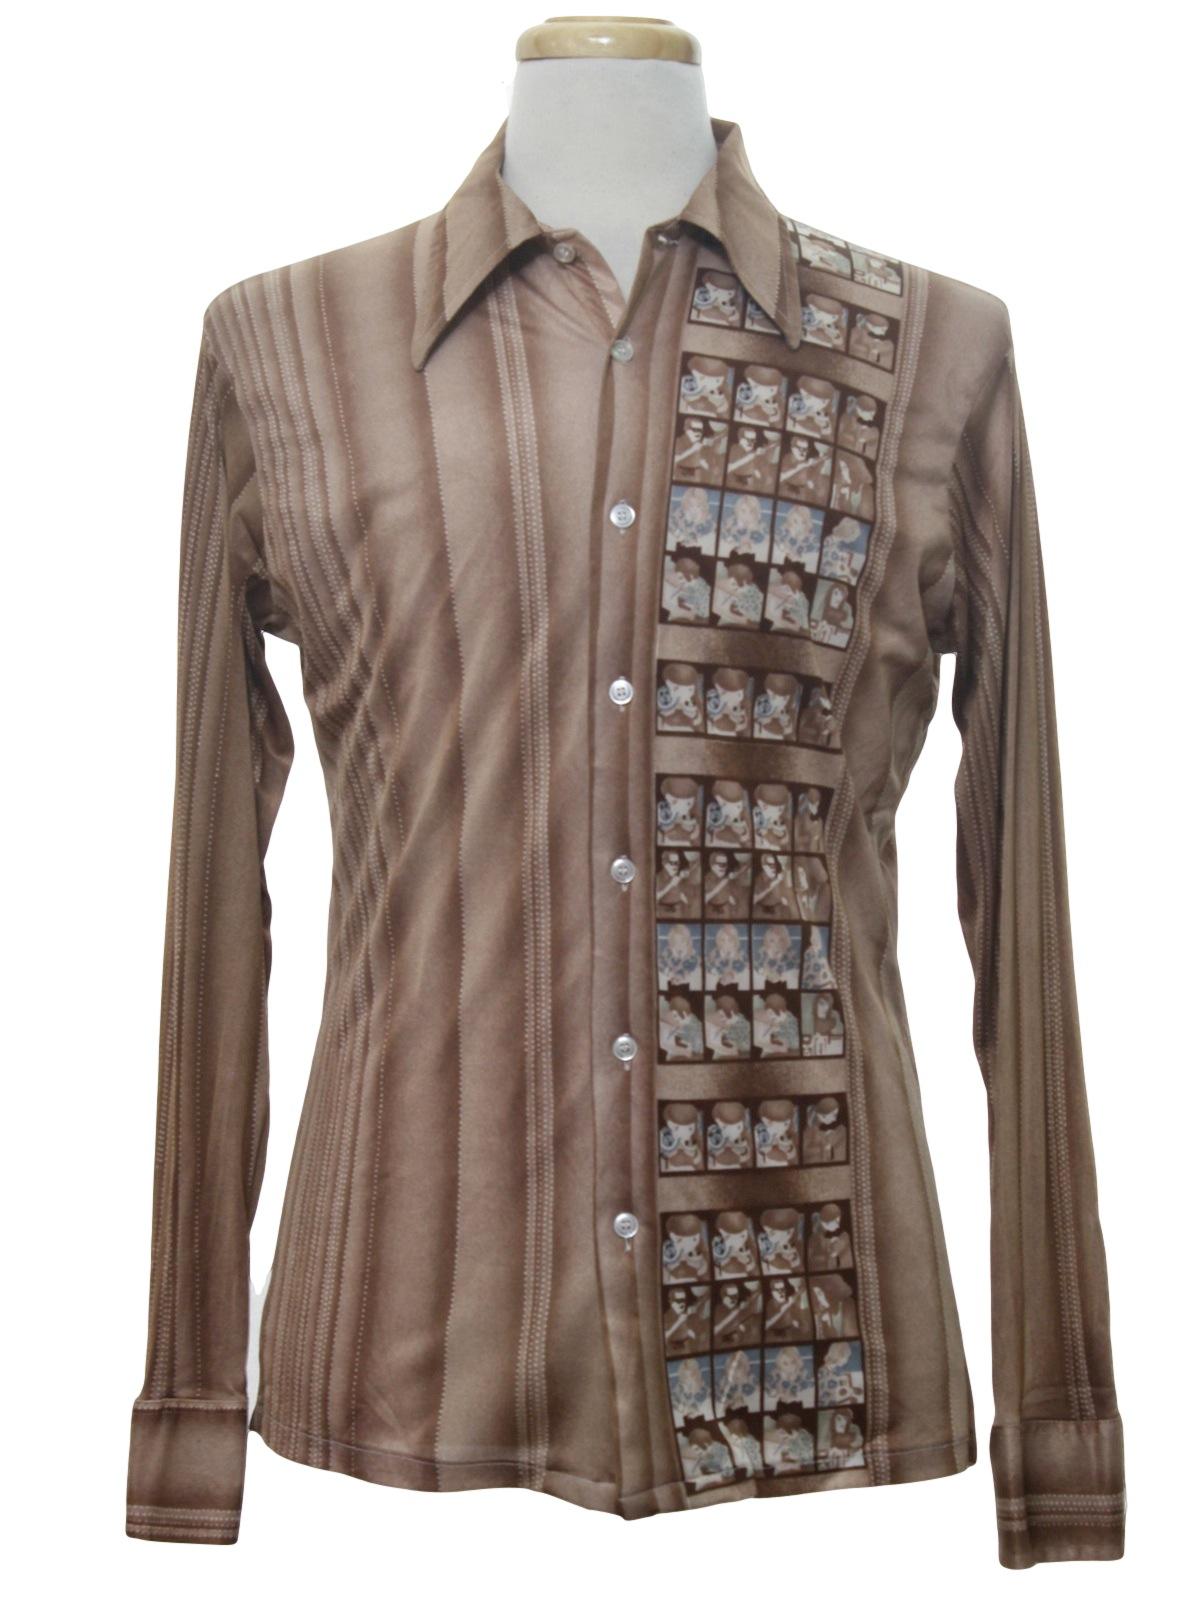 70s retro print disco shirt 70s kmart mens light brown for Kmart button up shirts